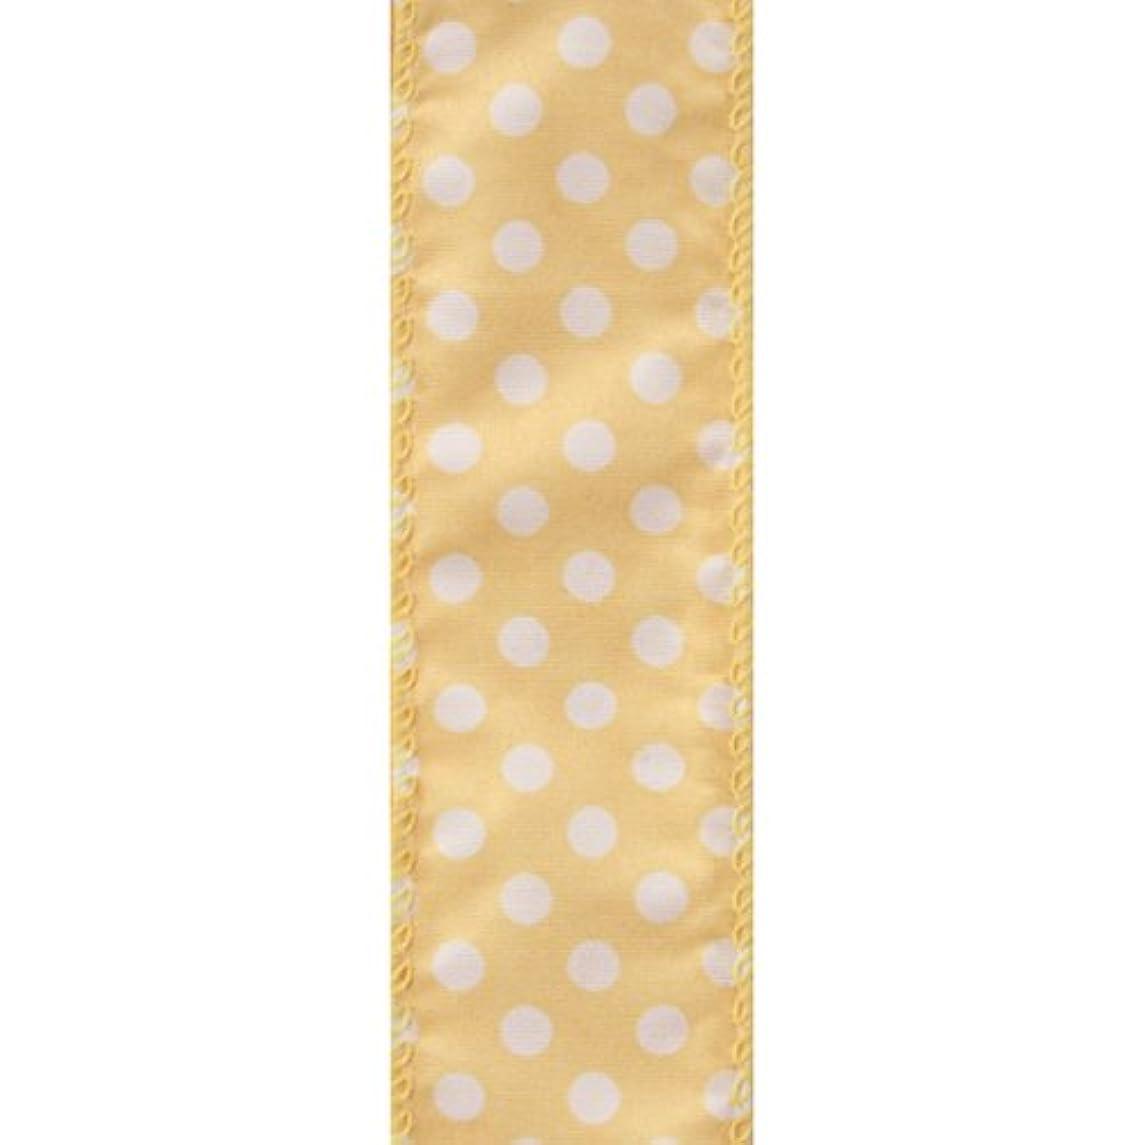 Berwick Offray LLC Lion Spring Value Wired Edge Ribbon-1-1/2 X 50yds-Yellow Ribbon